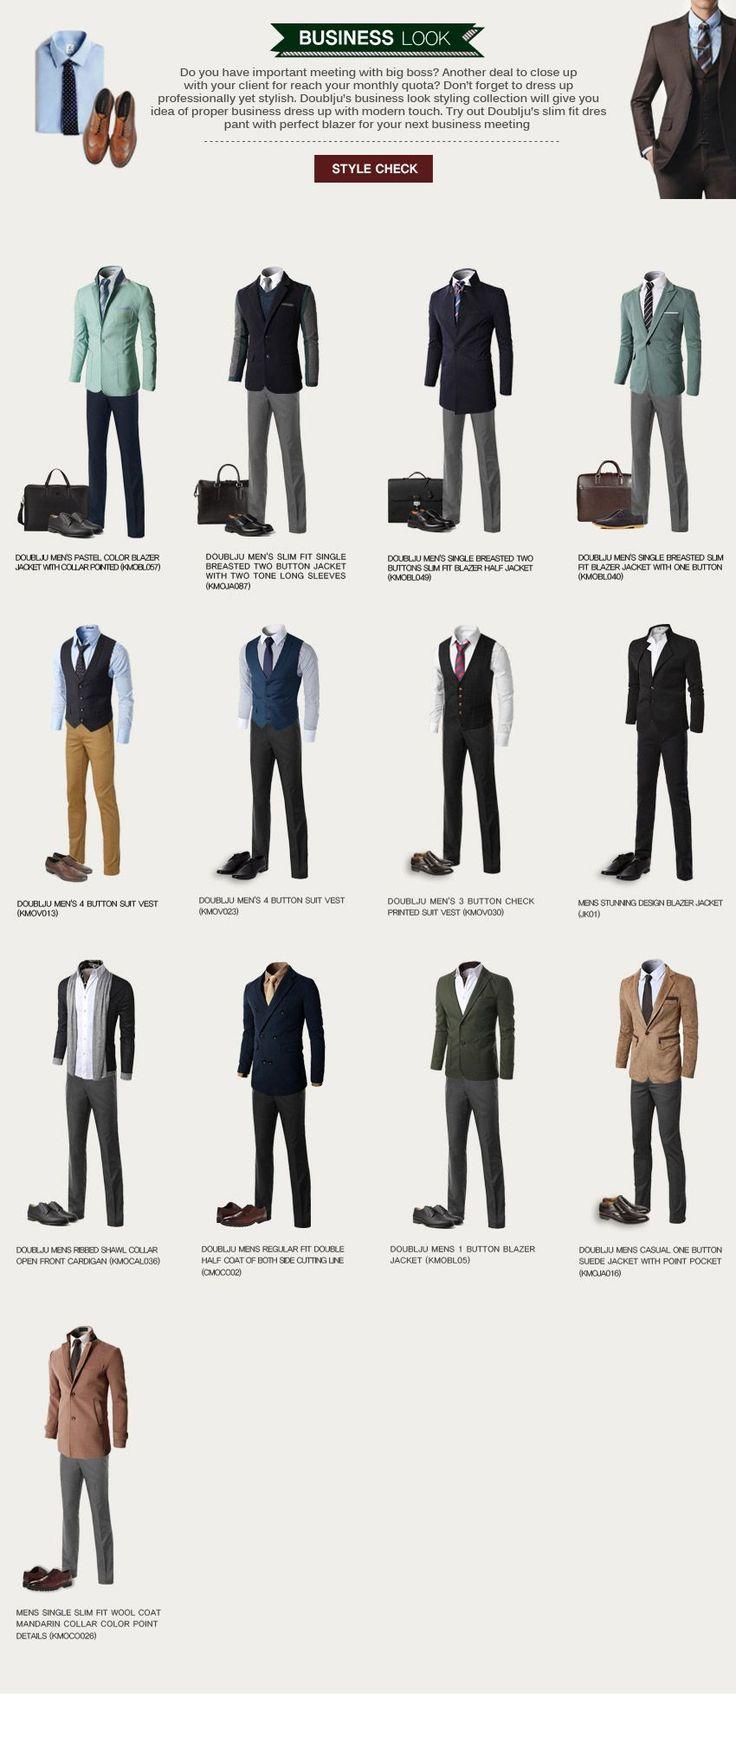 BUSINESS LOOK - DAILY LOOK Doublju #officedesignsformen